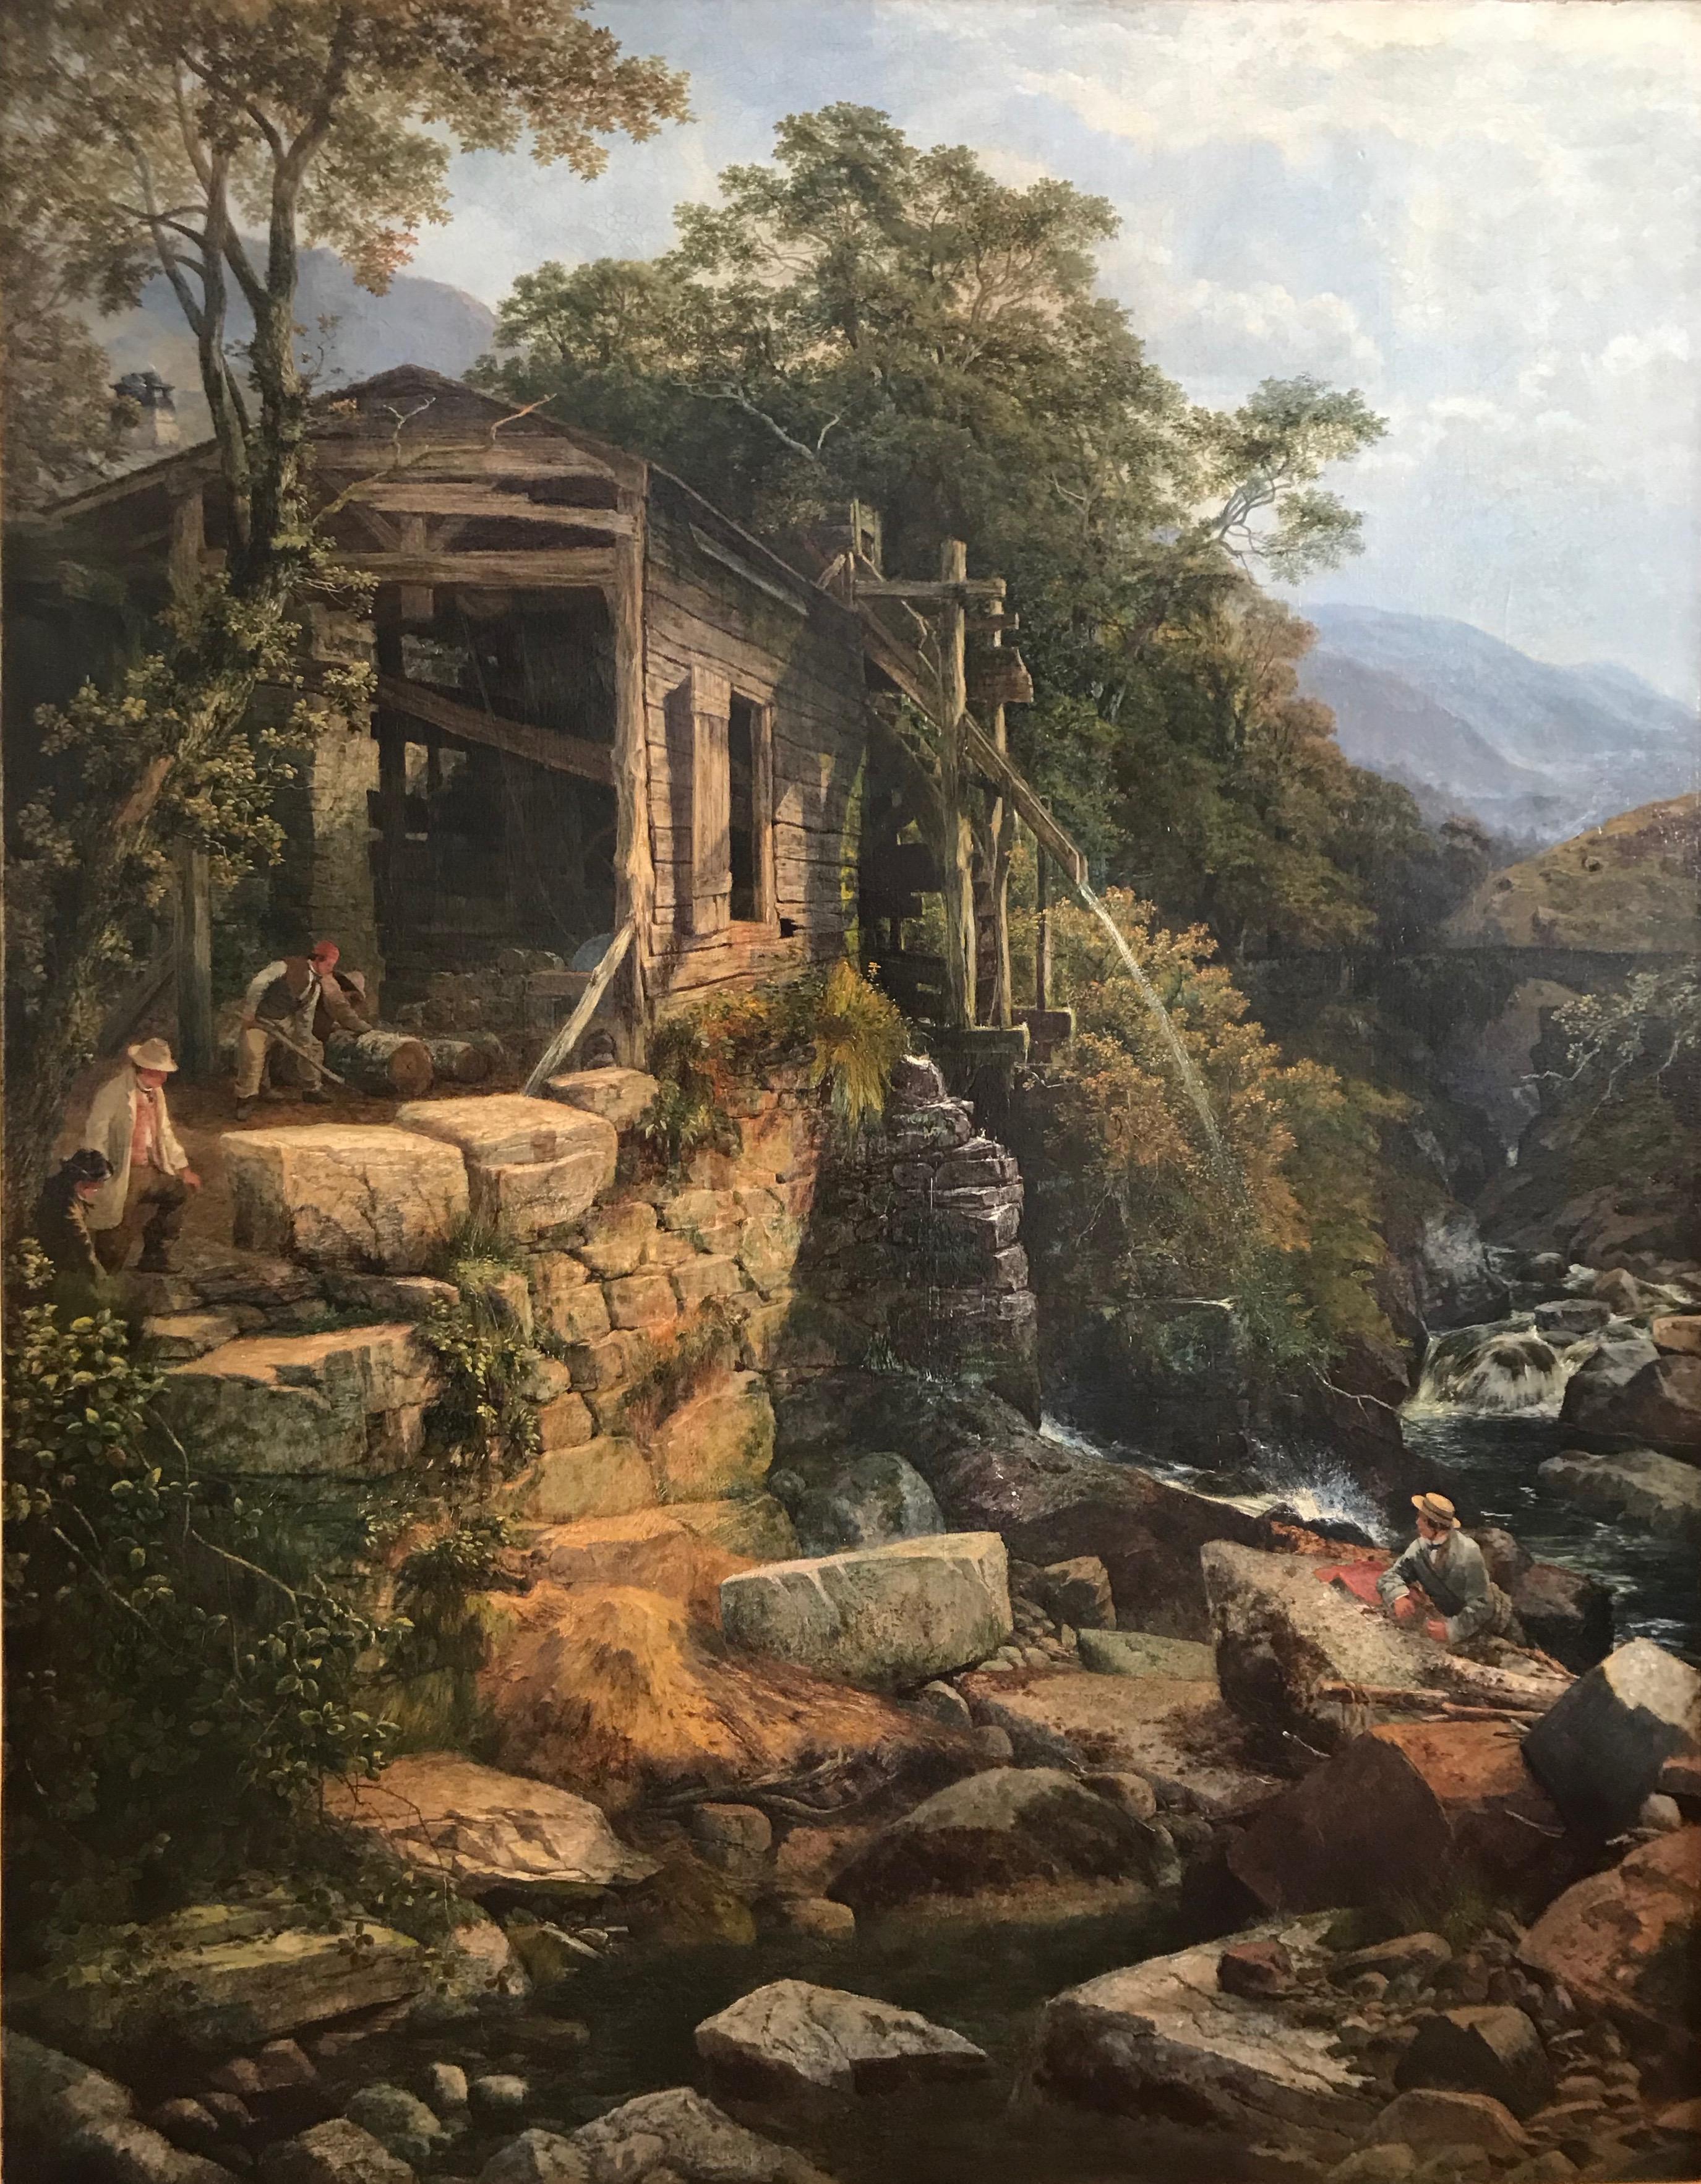 Joseph Paul Pettitt, Very large Victorian river landscape, North Wales